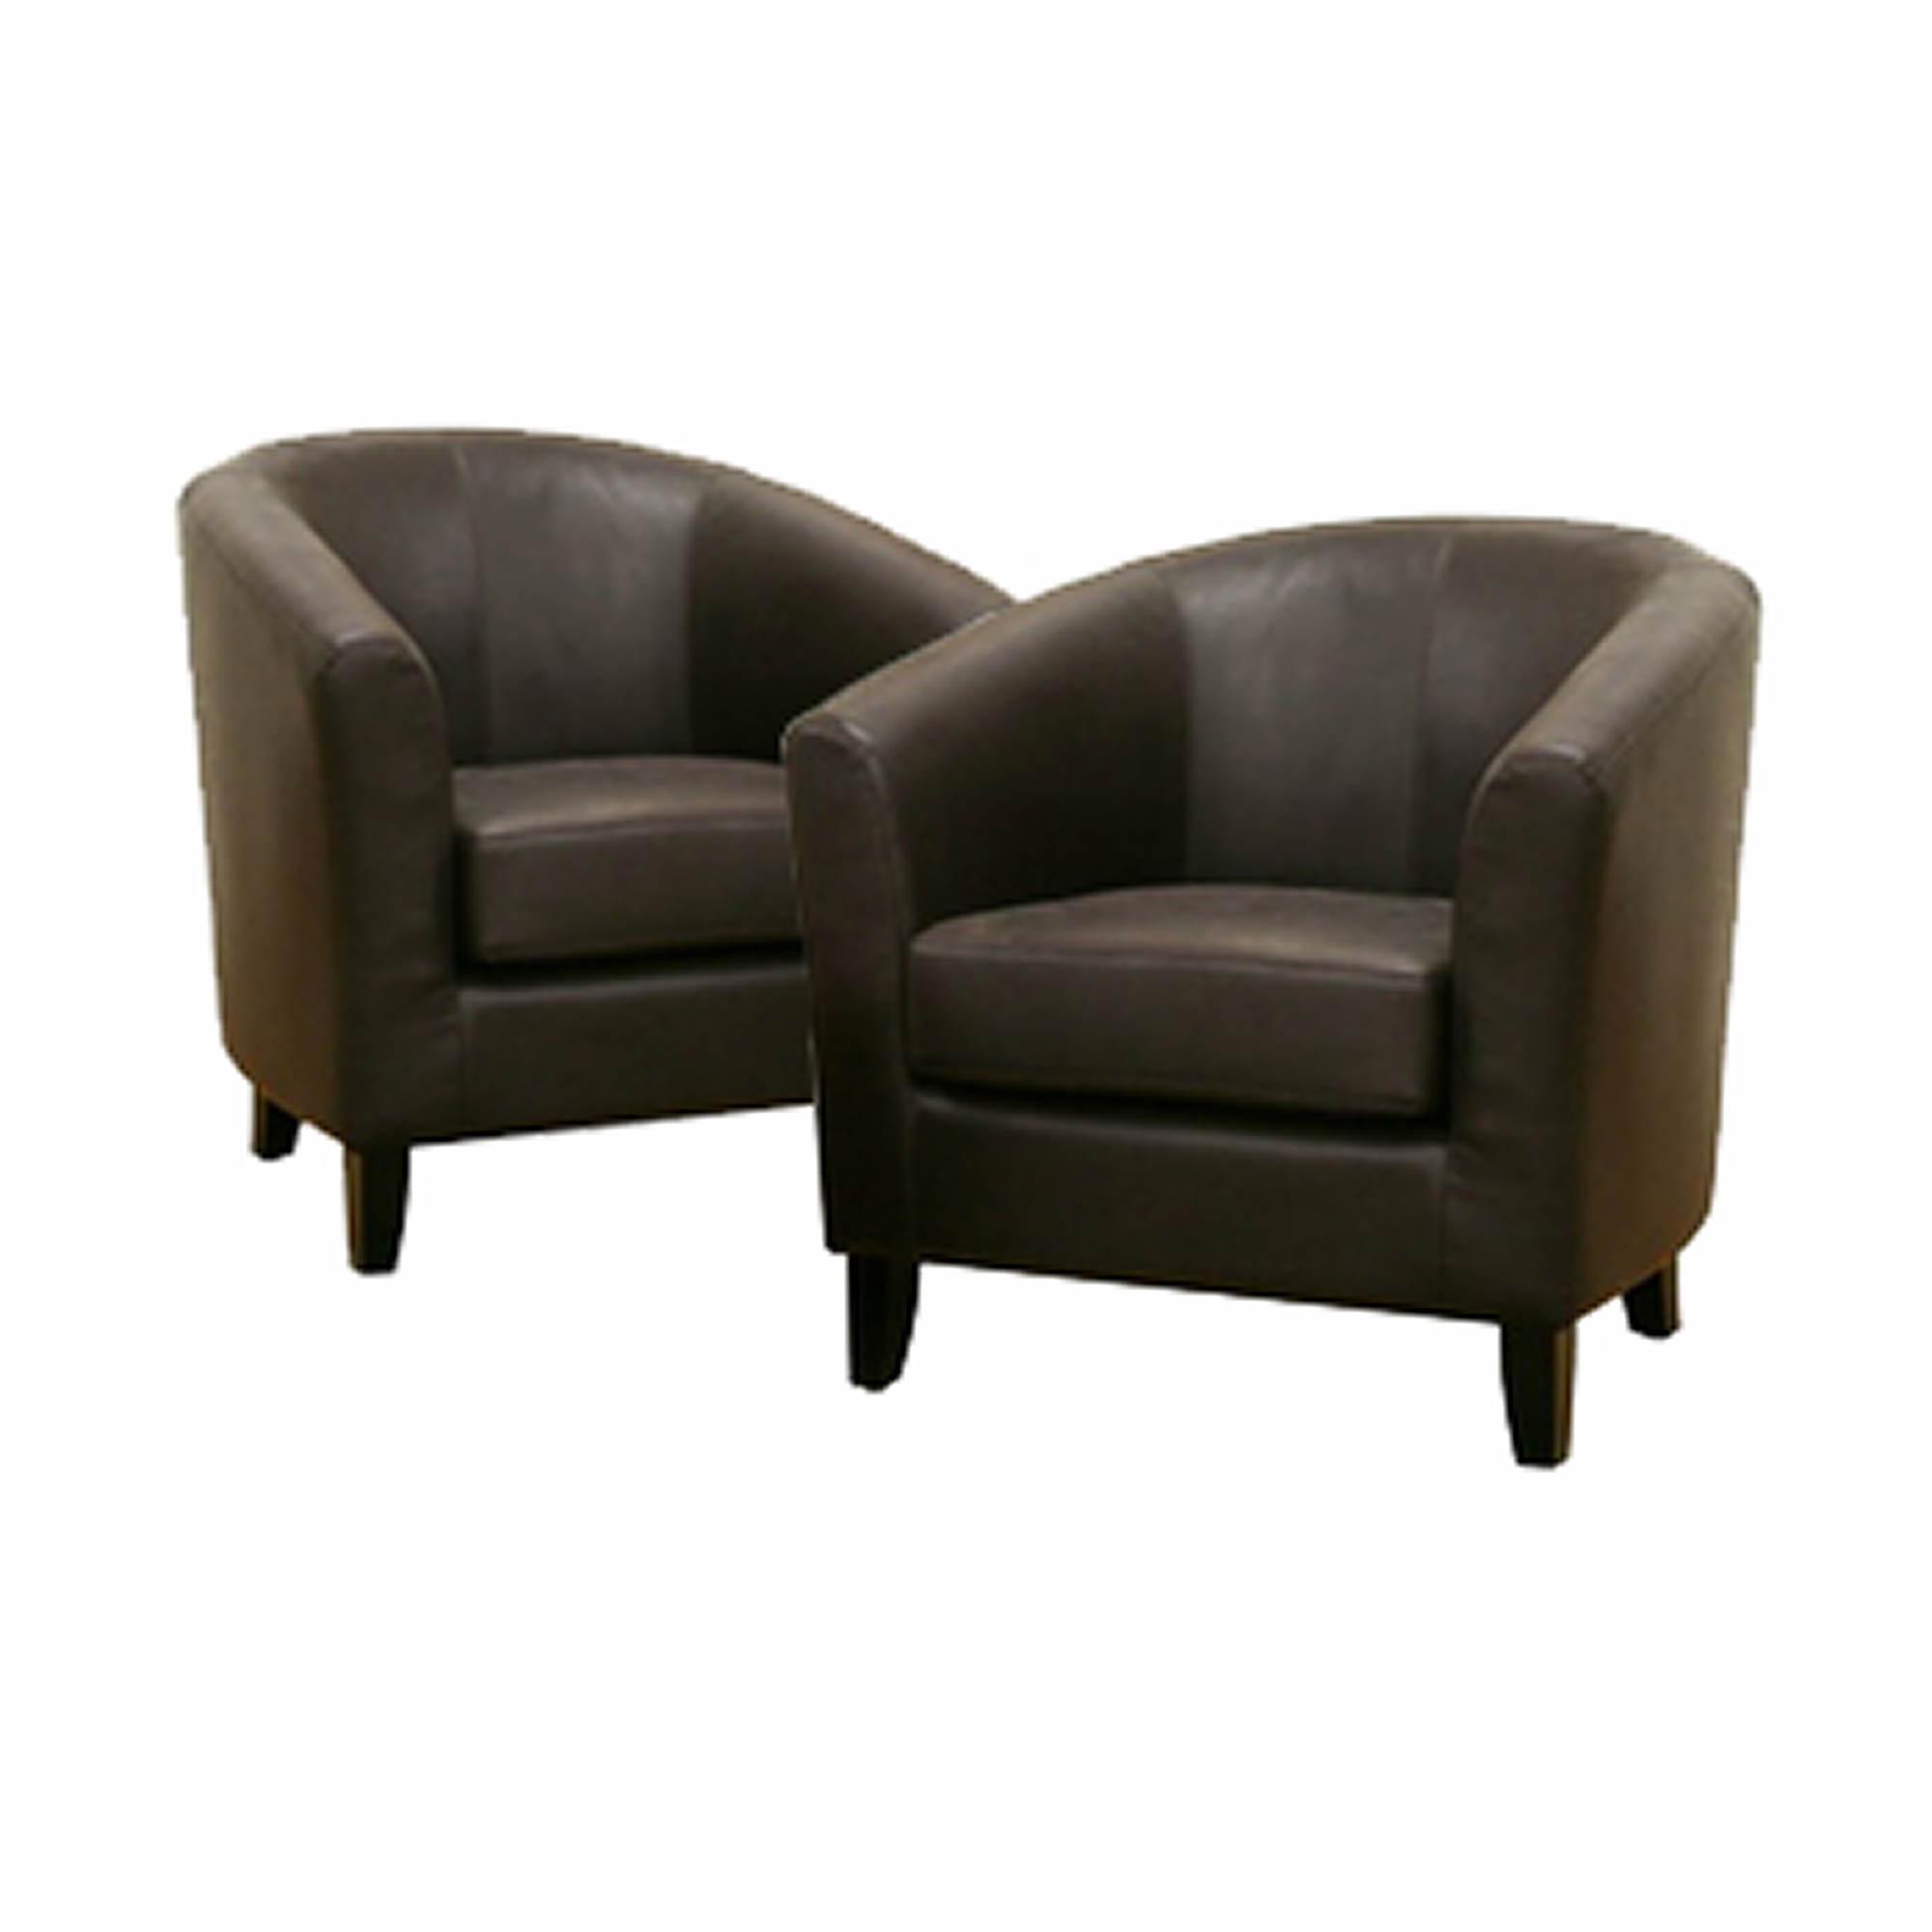 Baxton Studio Belinda Bonded Leather Club Chairs Set Of 2